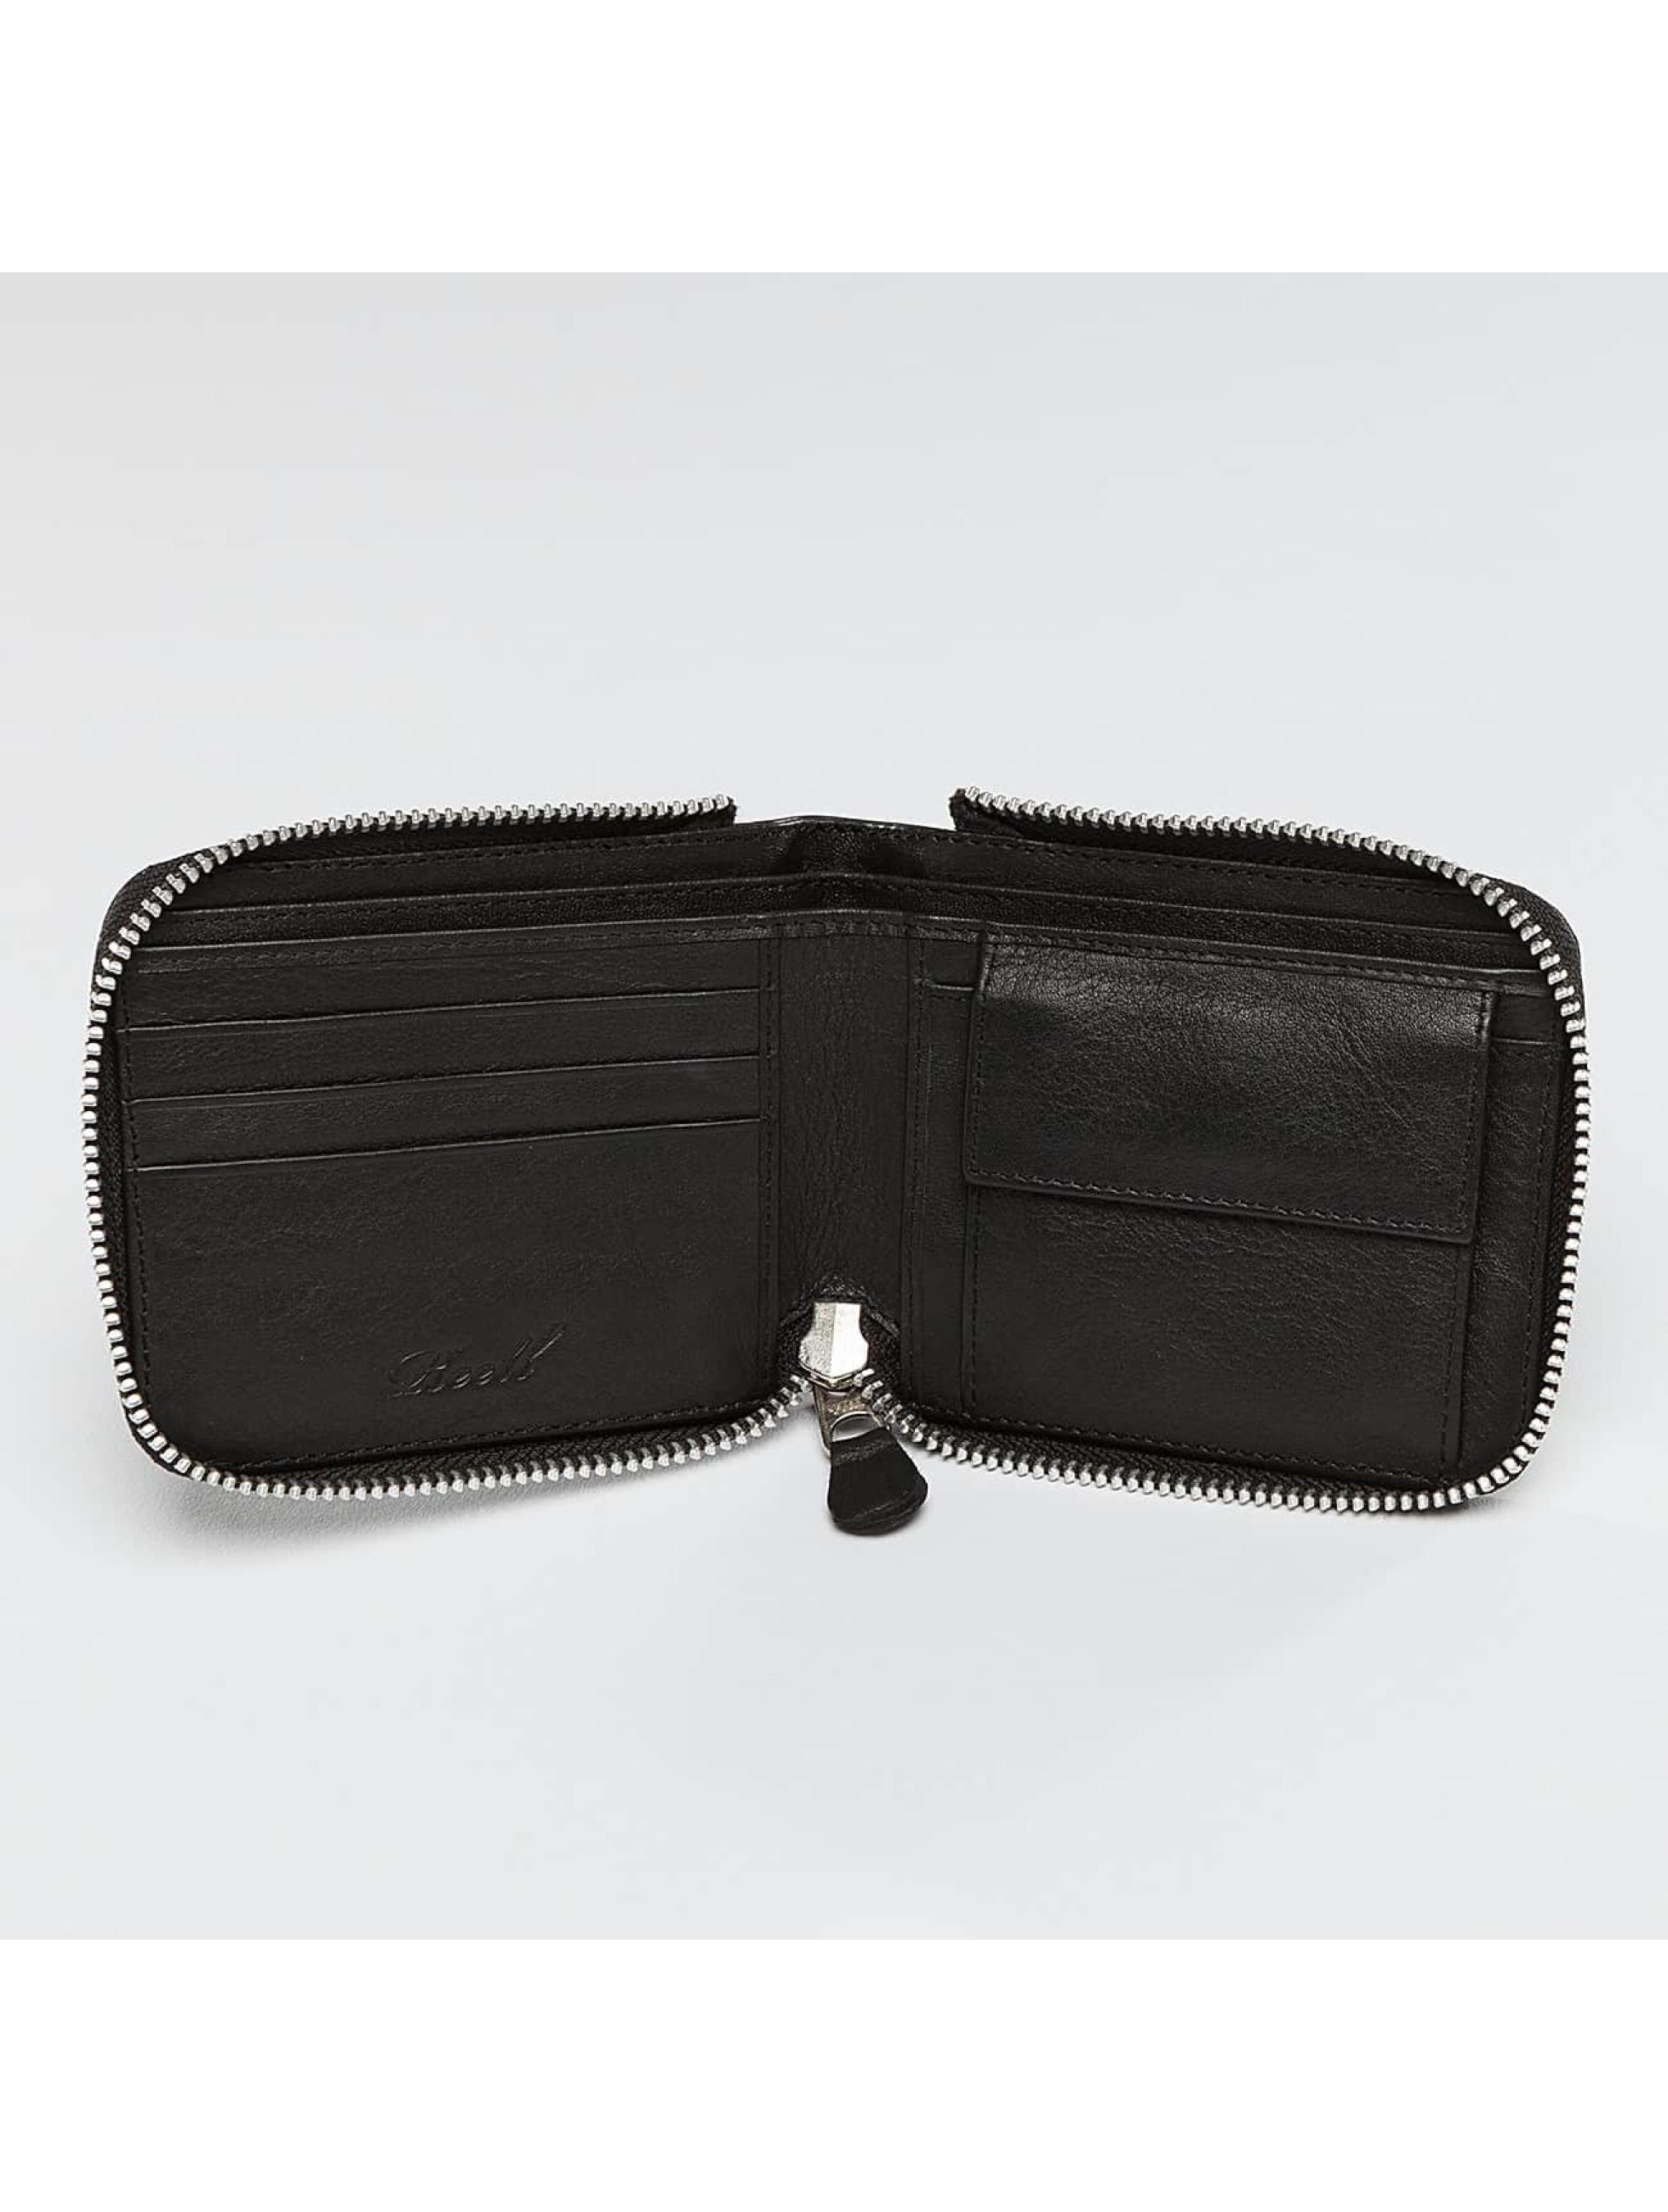 Reell Jeans Wallet Zip Leather black